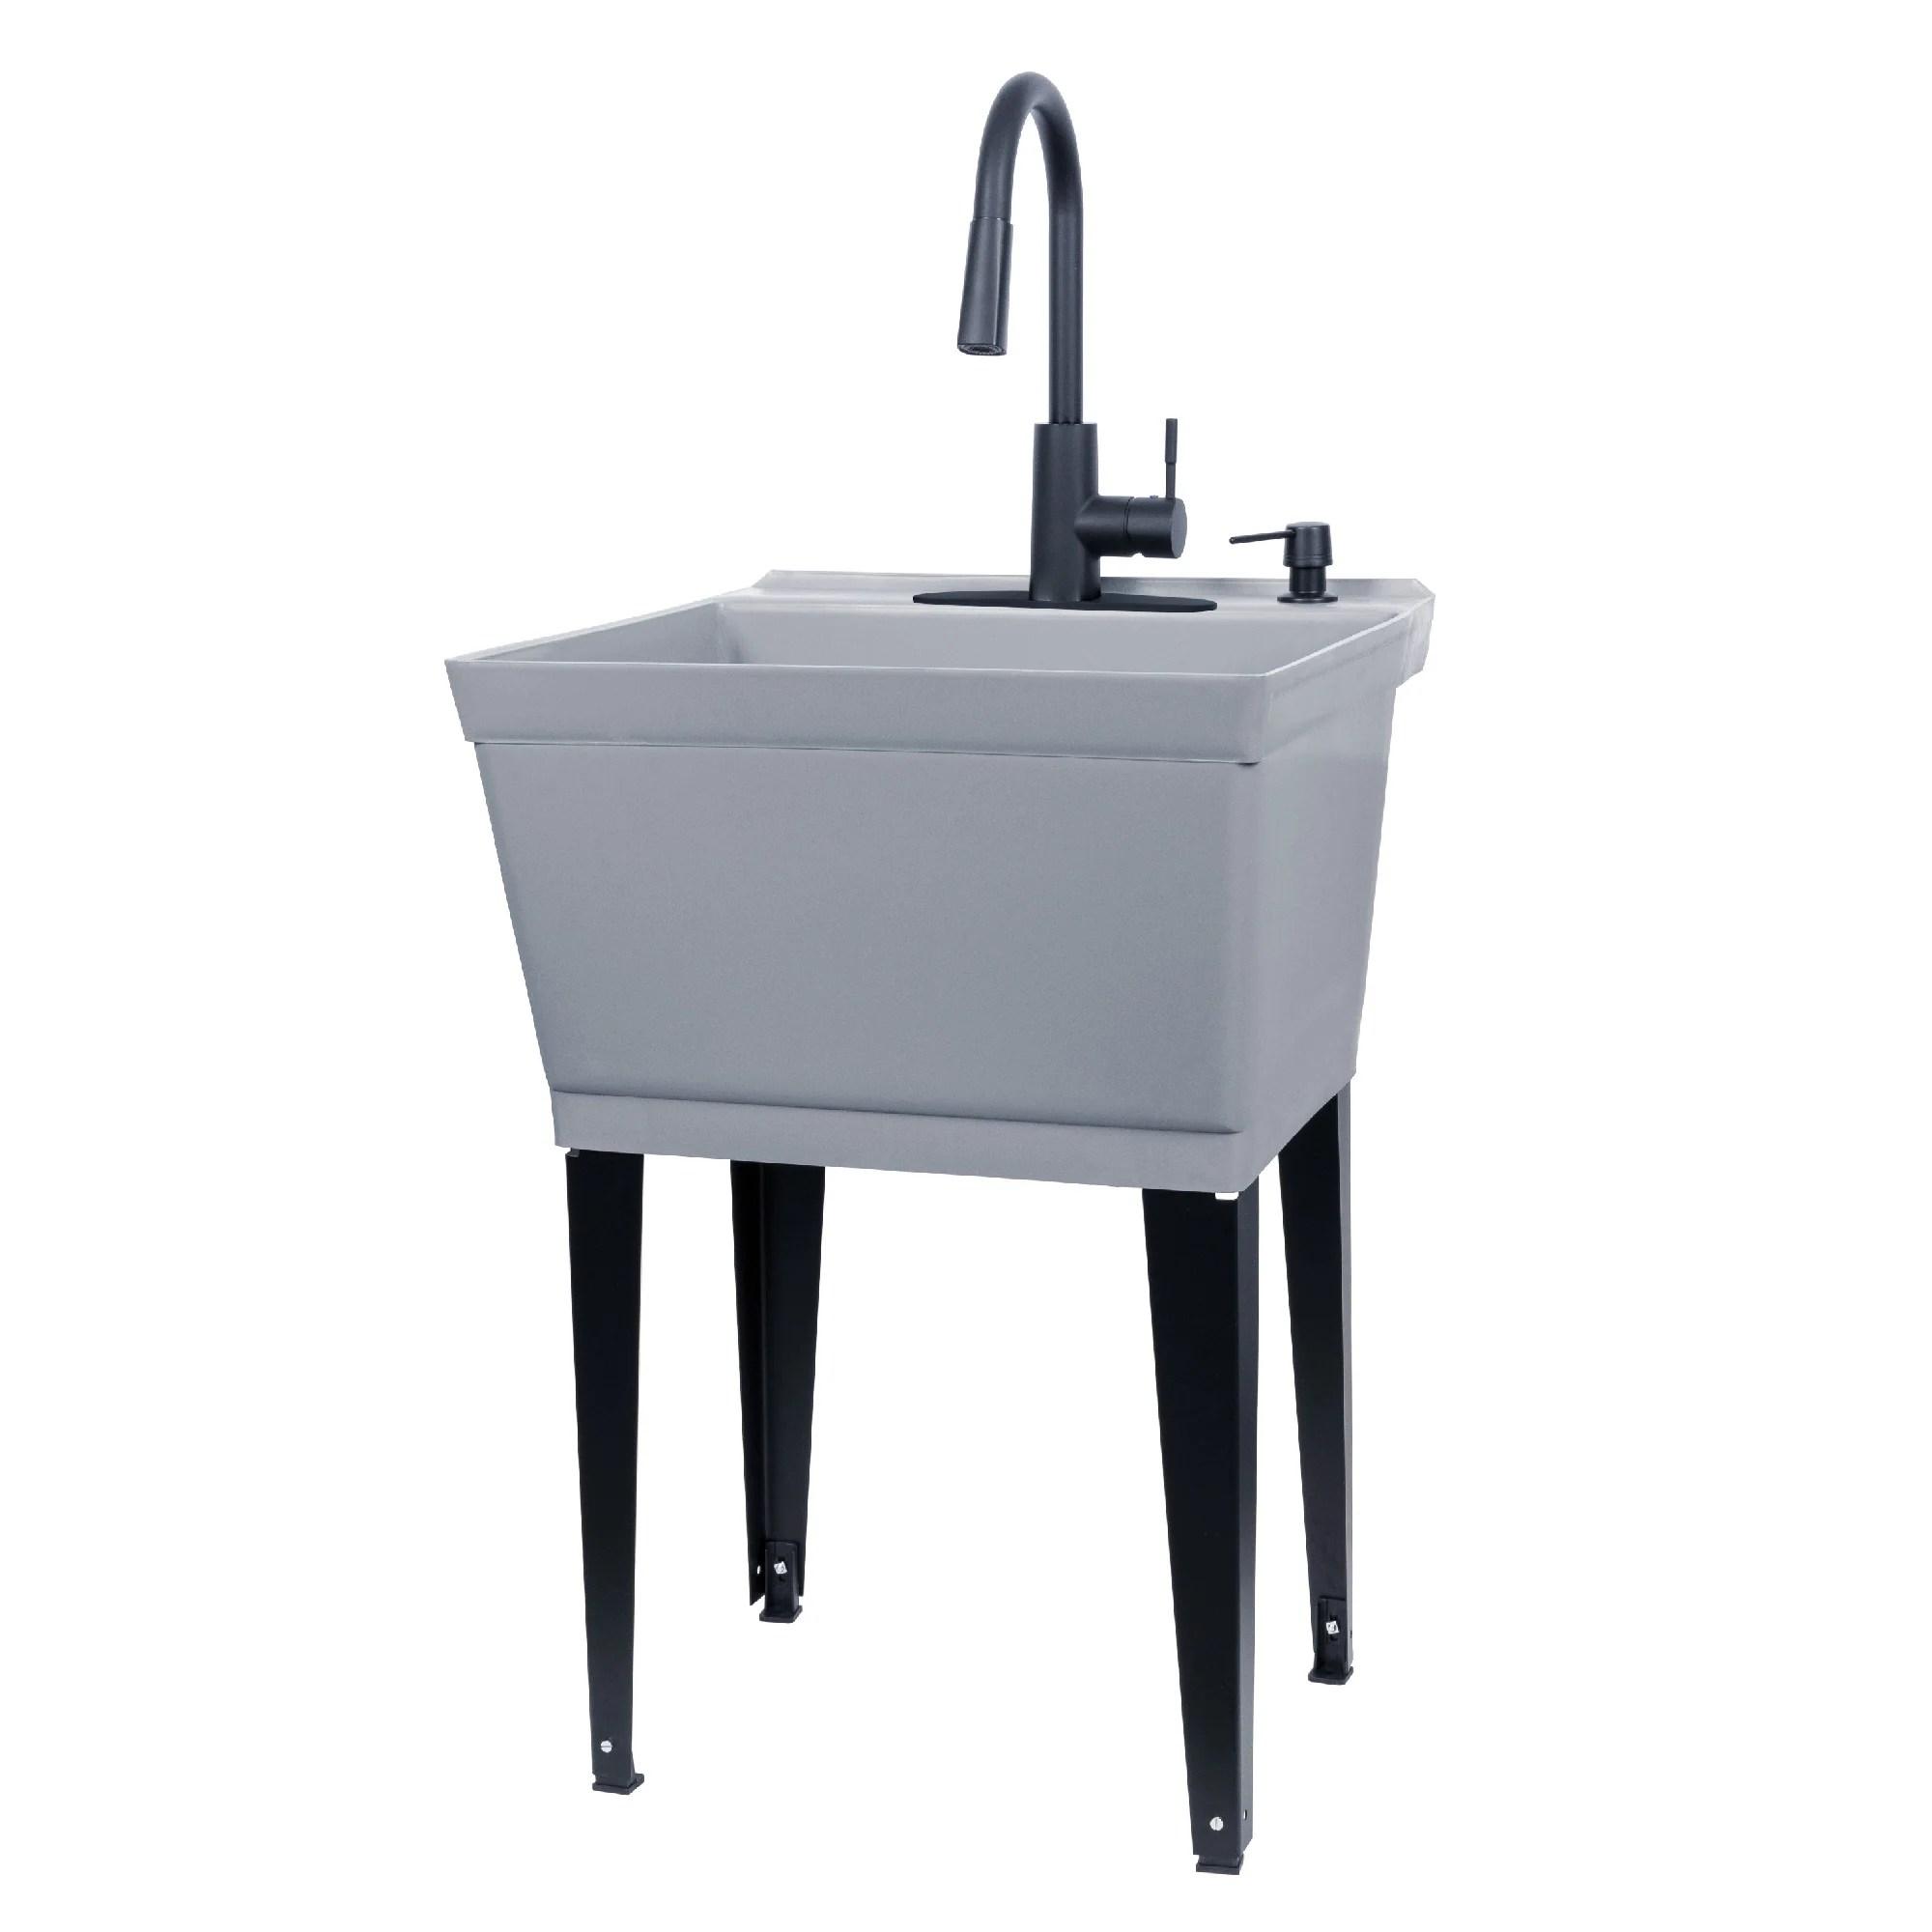 tehila utility sink with black high arc faucet 19 gallon grey